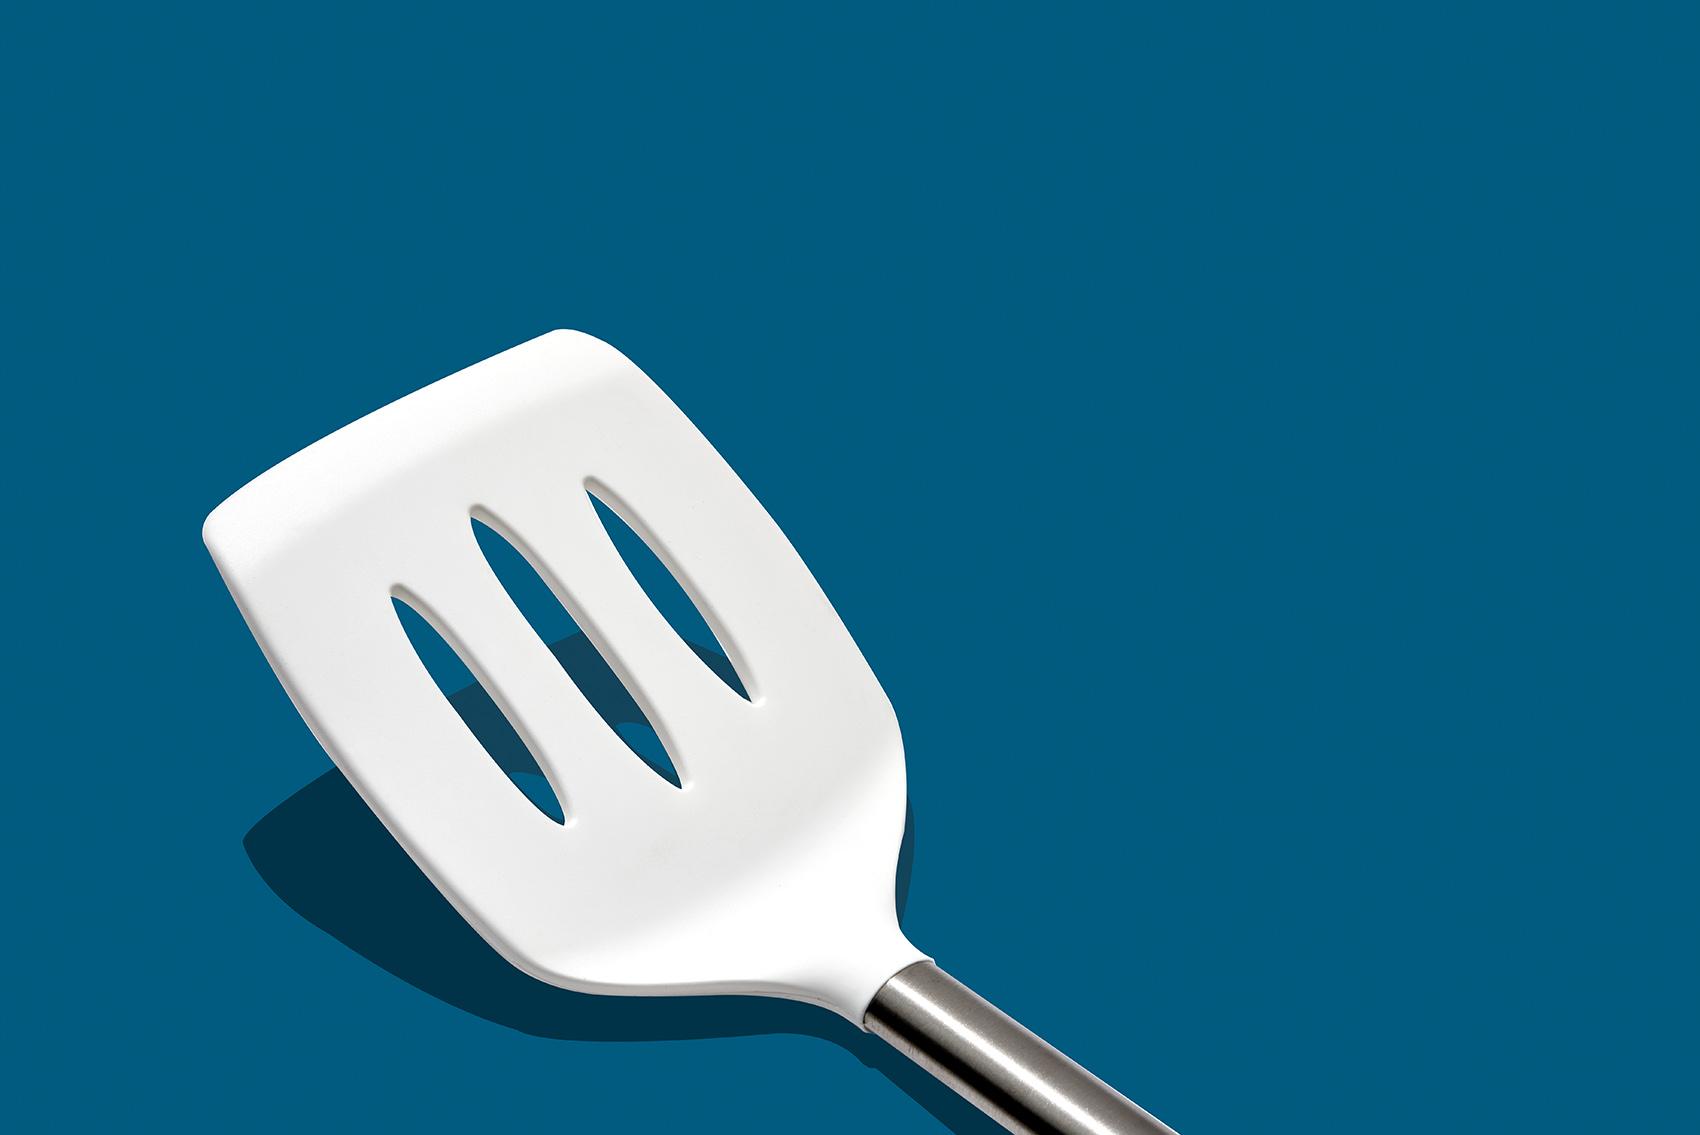 beautiful modern still life of spatula kitchen utensil on blue background